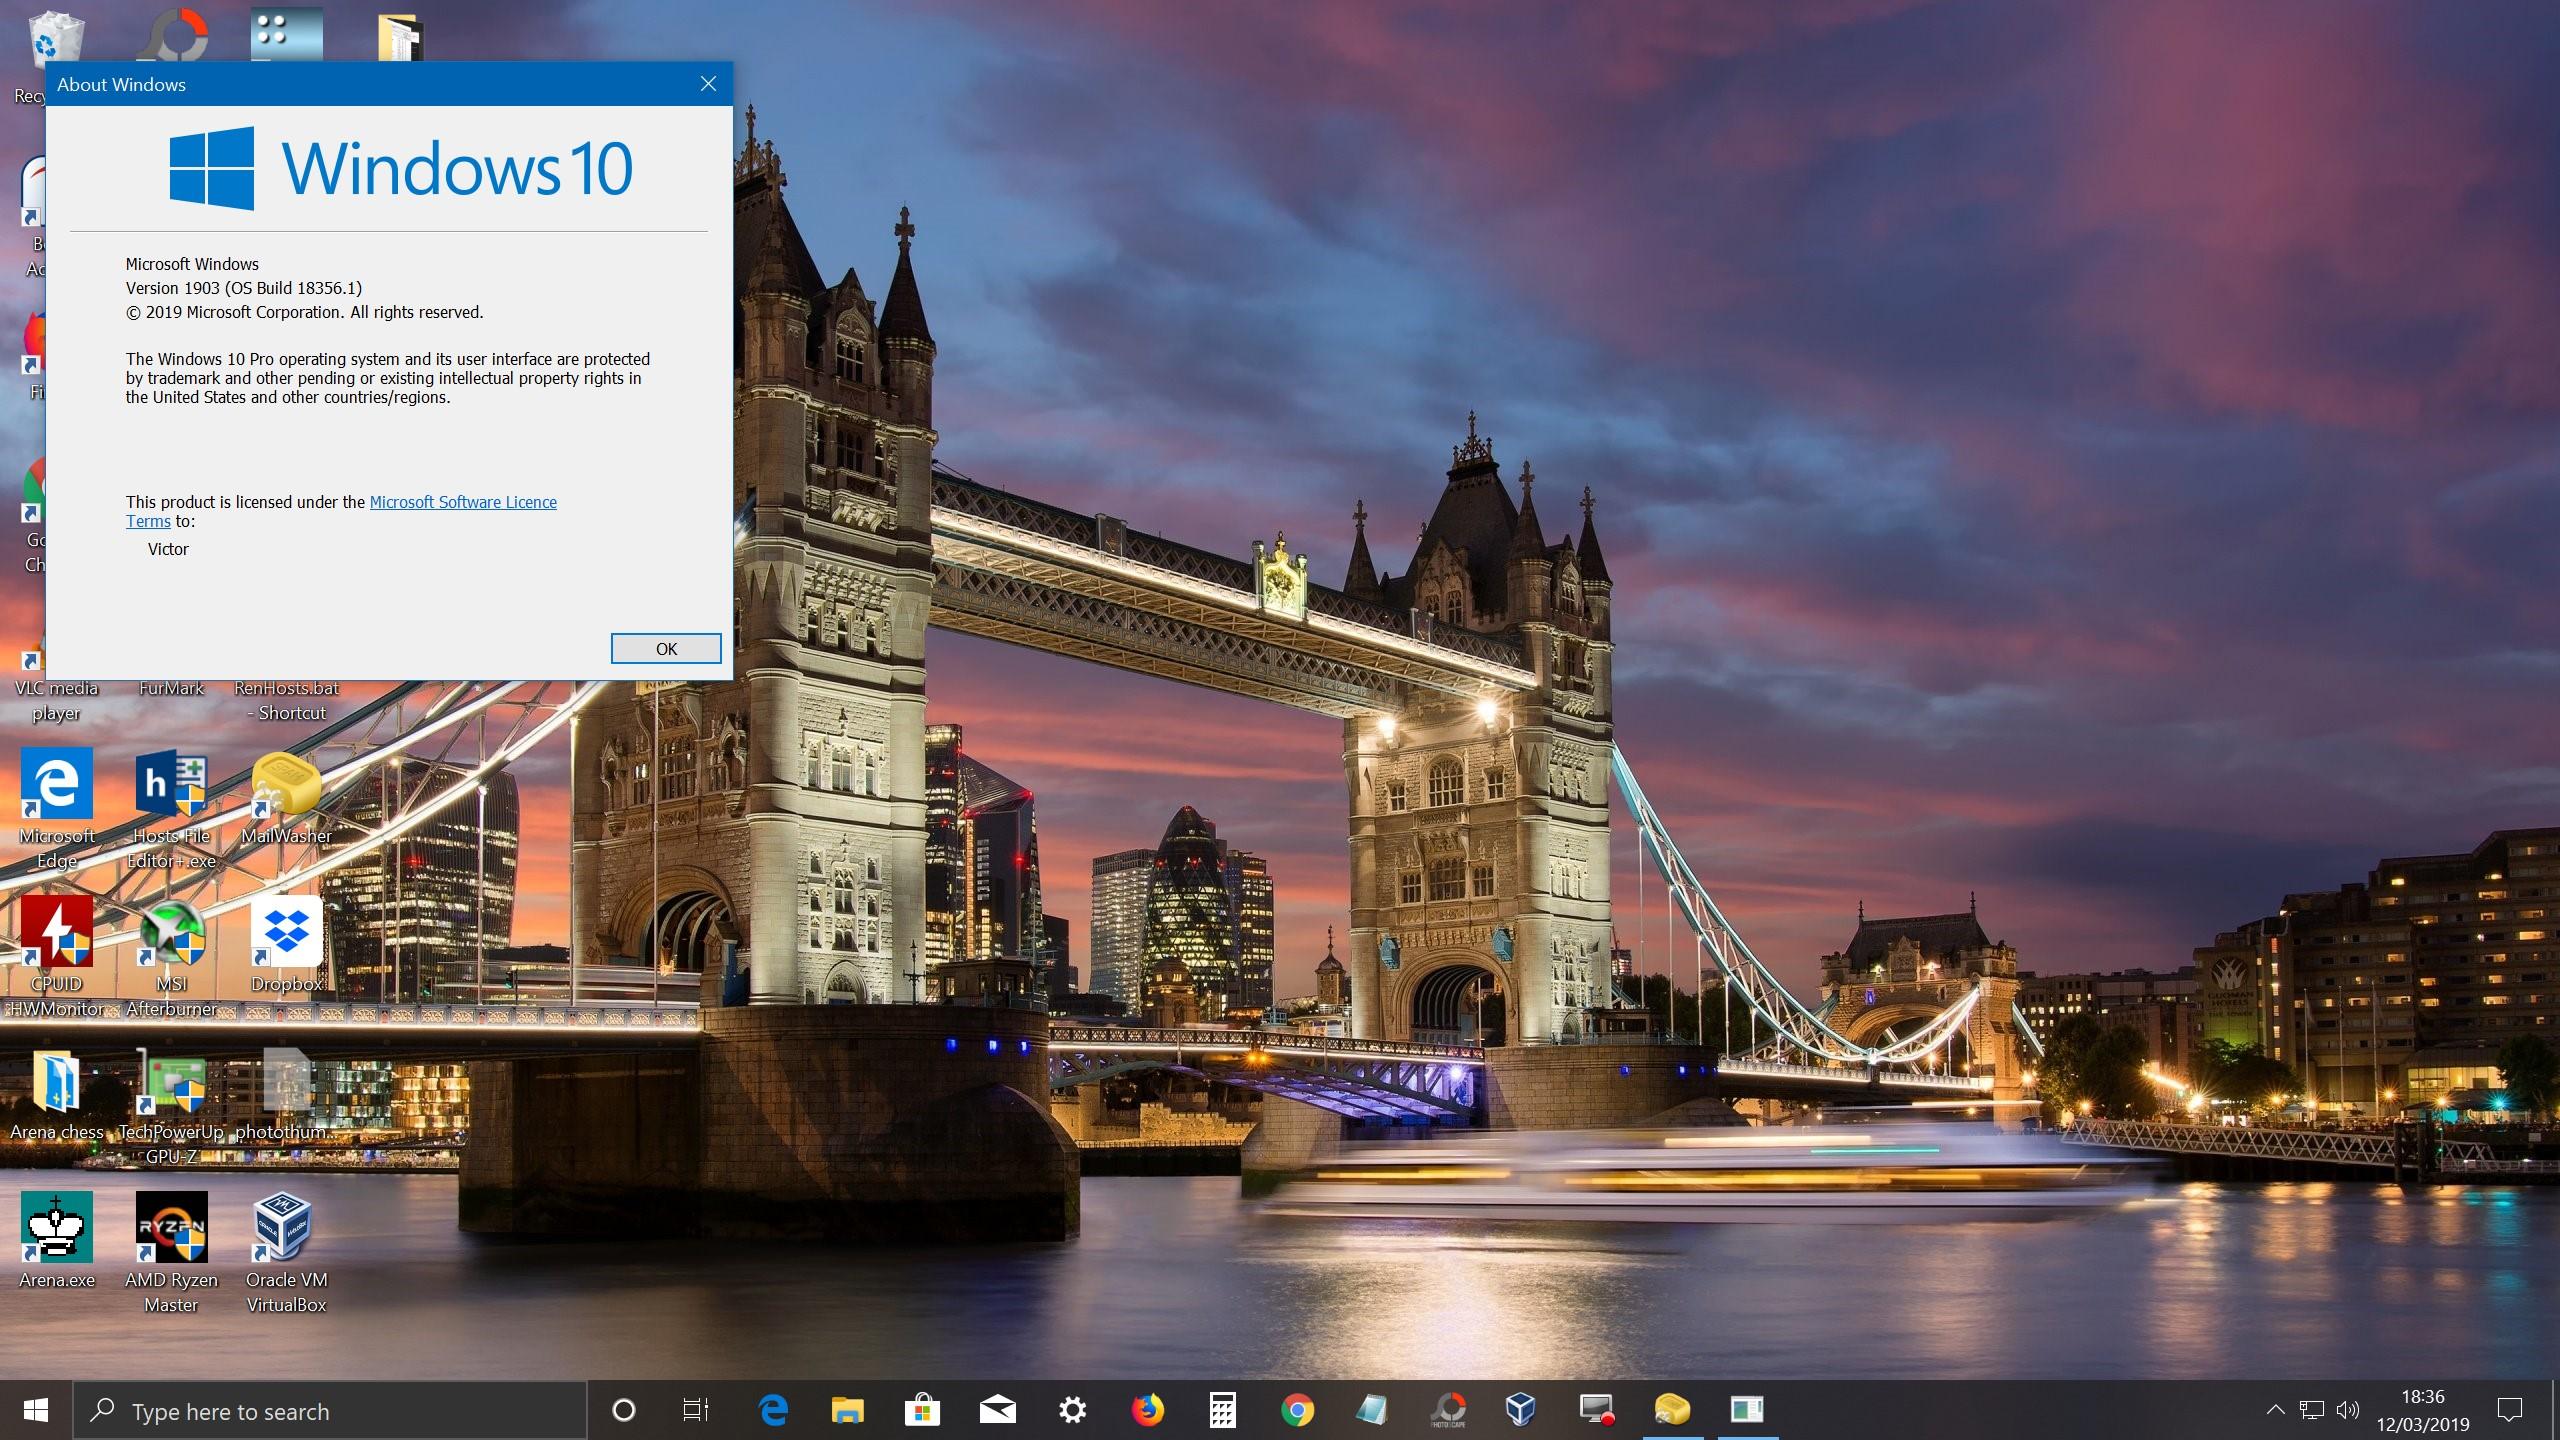 I downloaded Windows 10 vers 1803 - Page 8 - Virgin Media Community